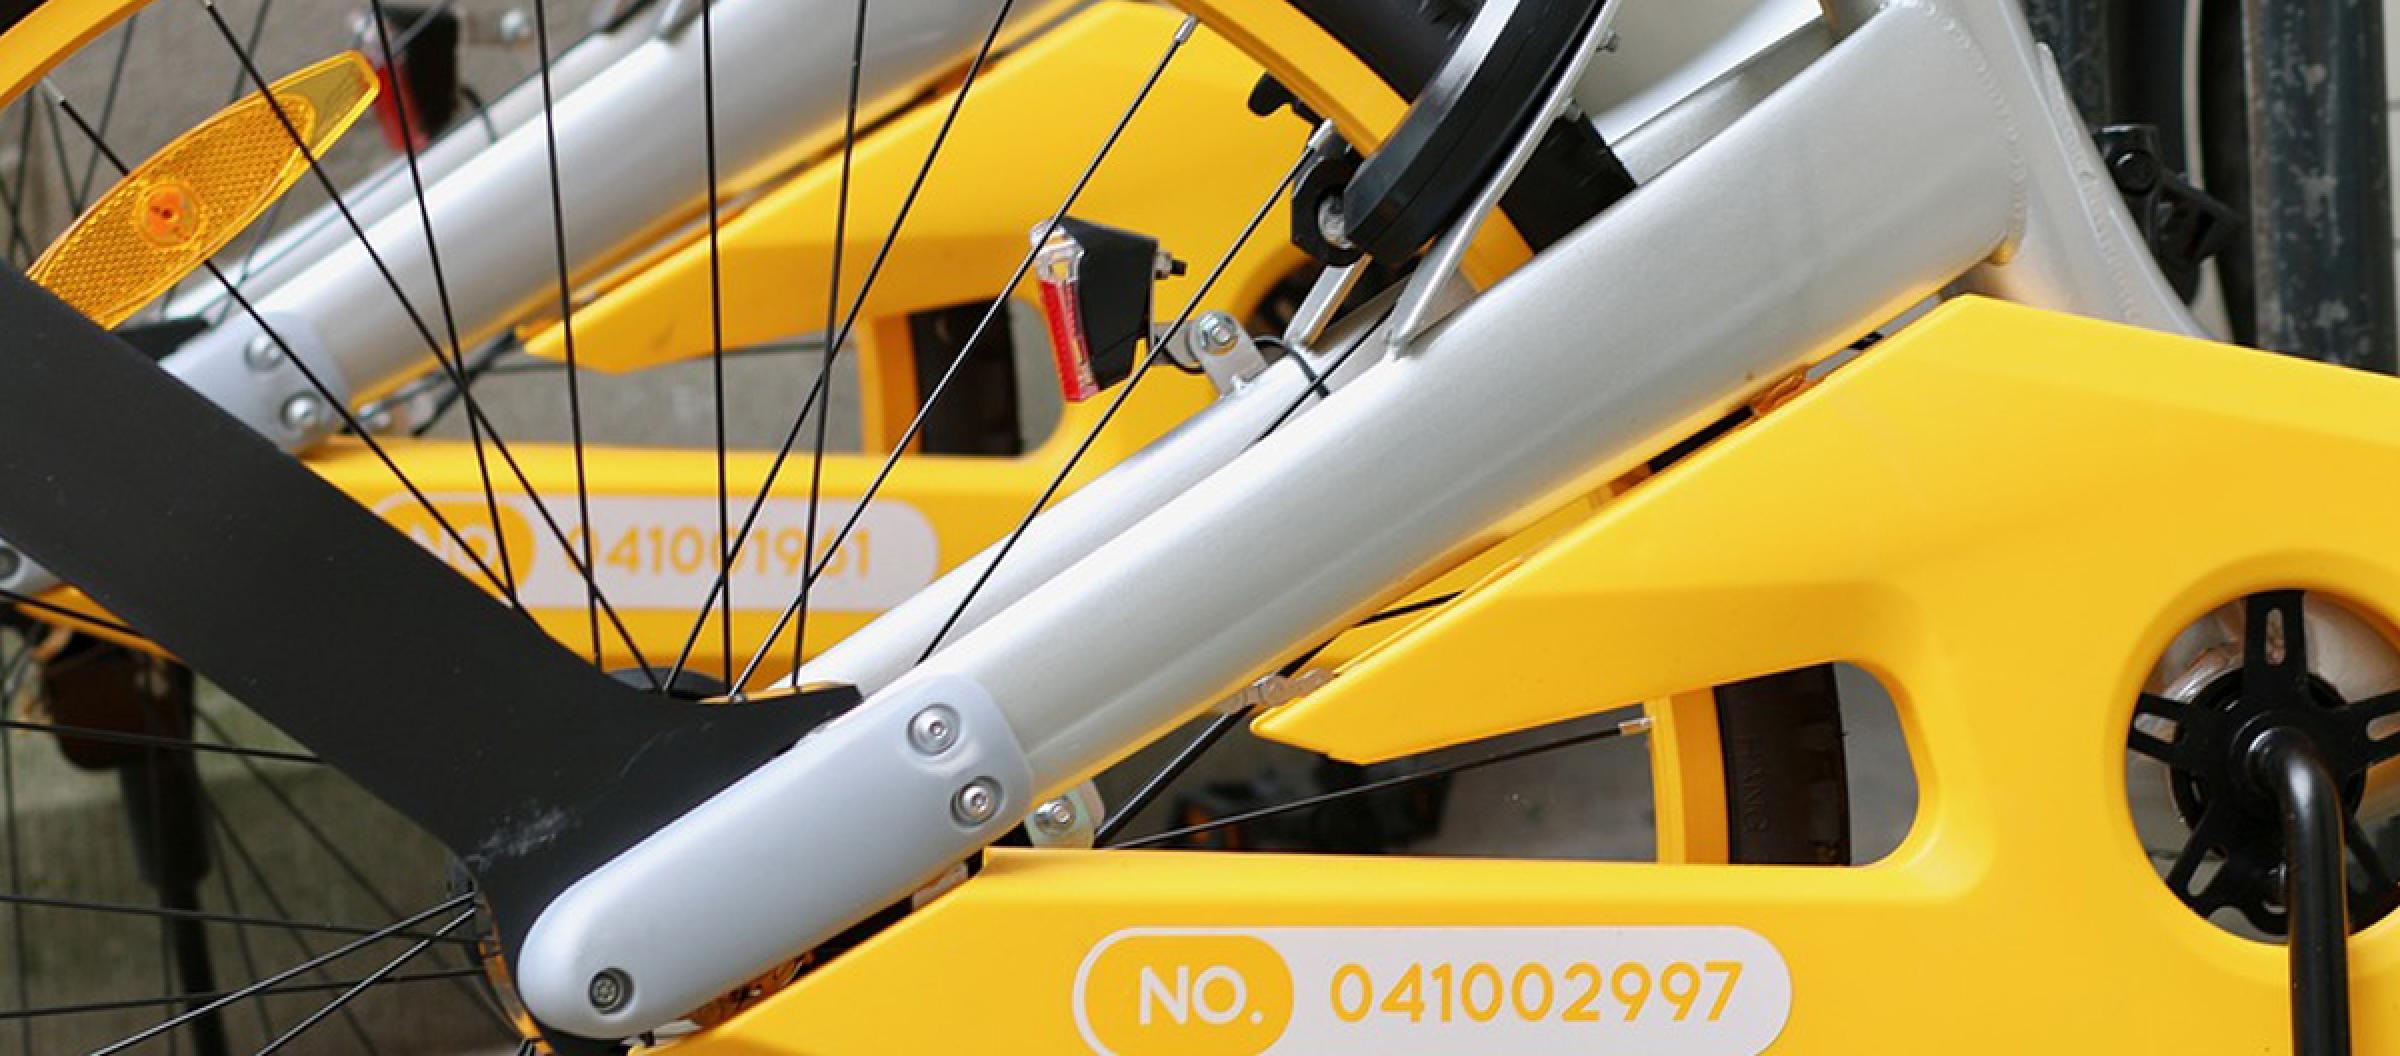 Leisure Biciclette